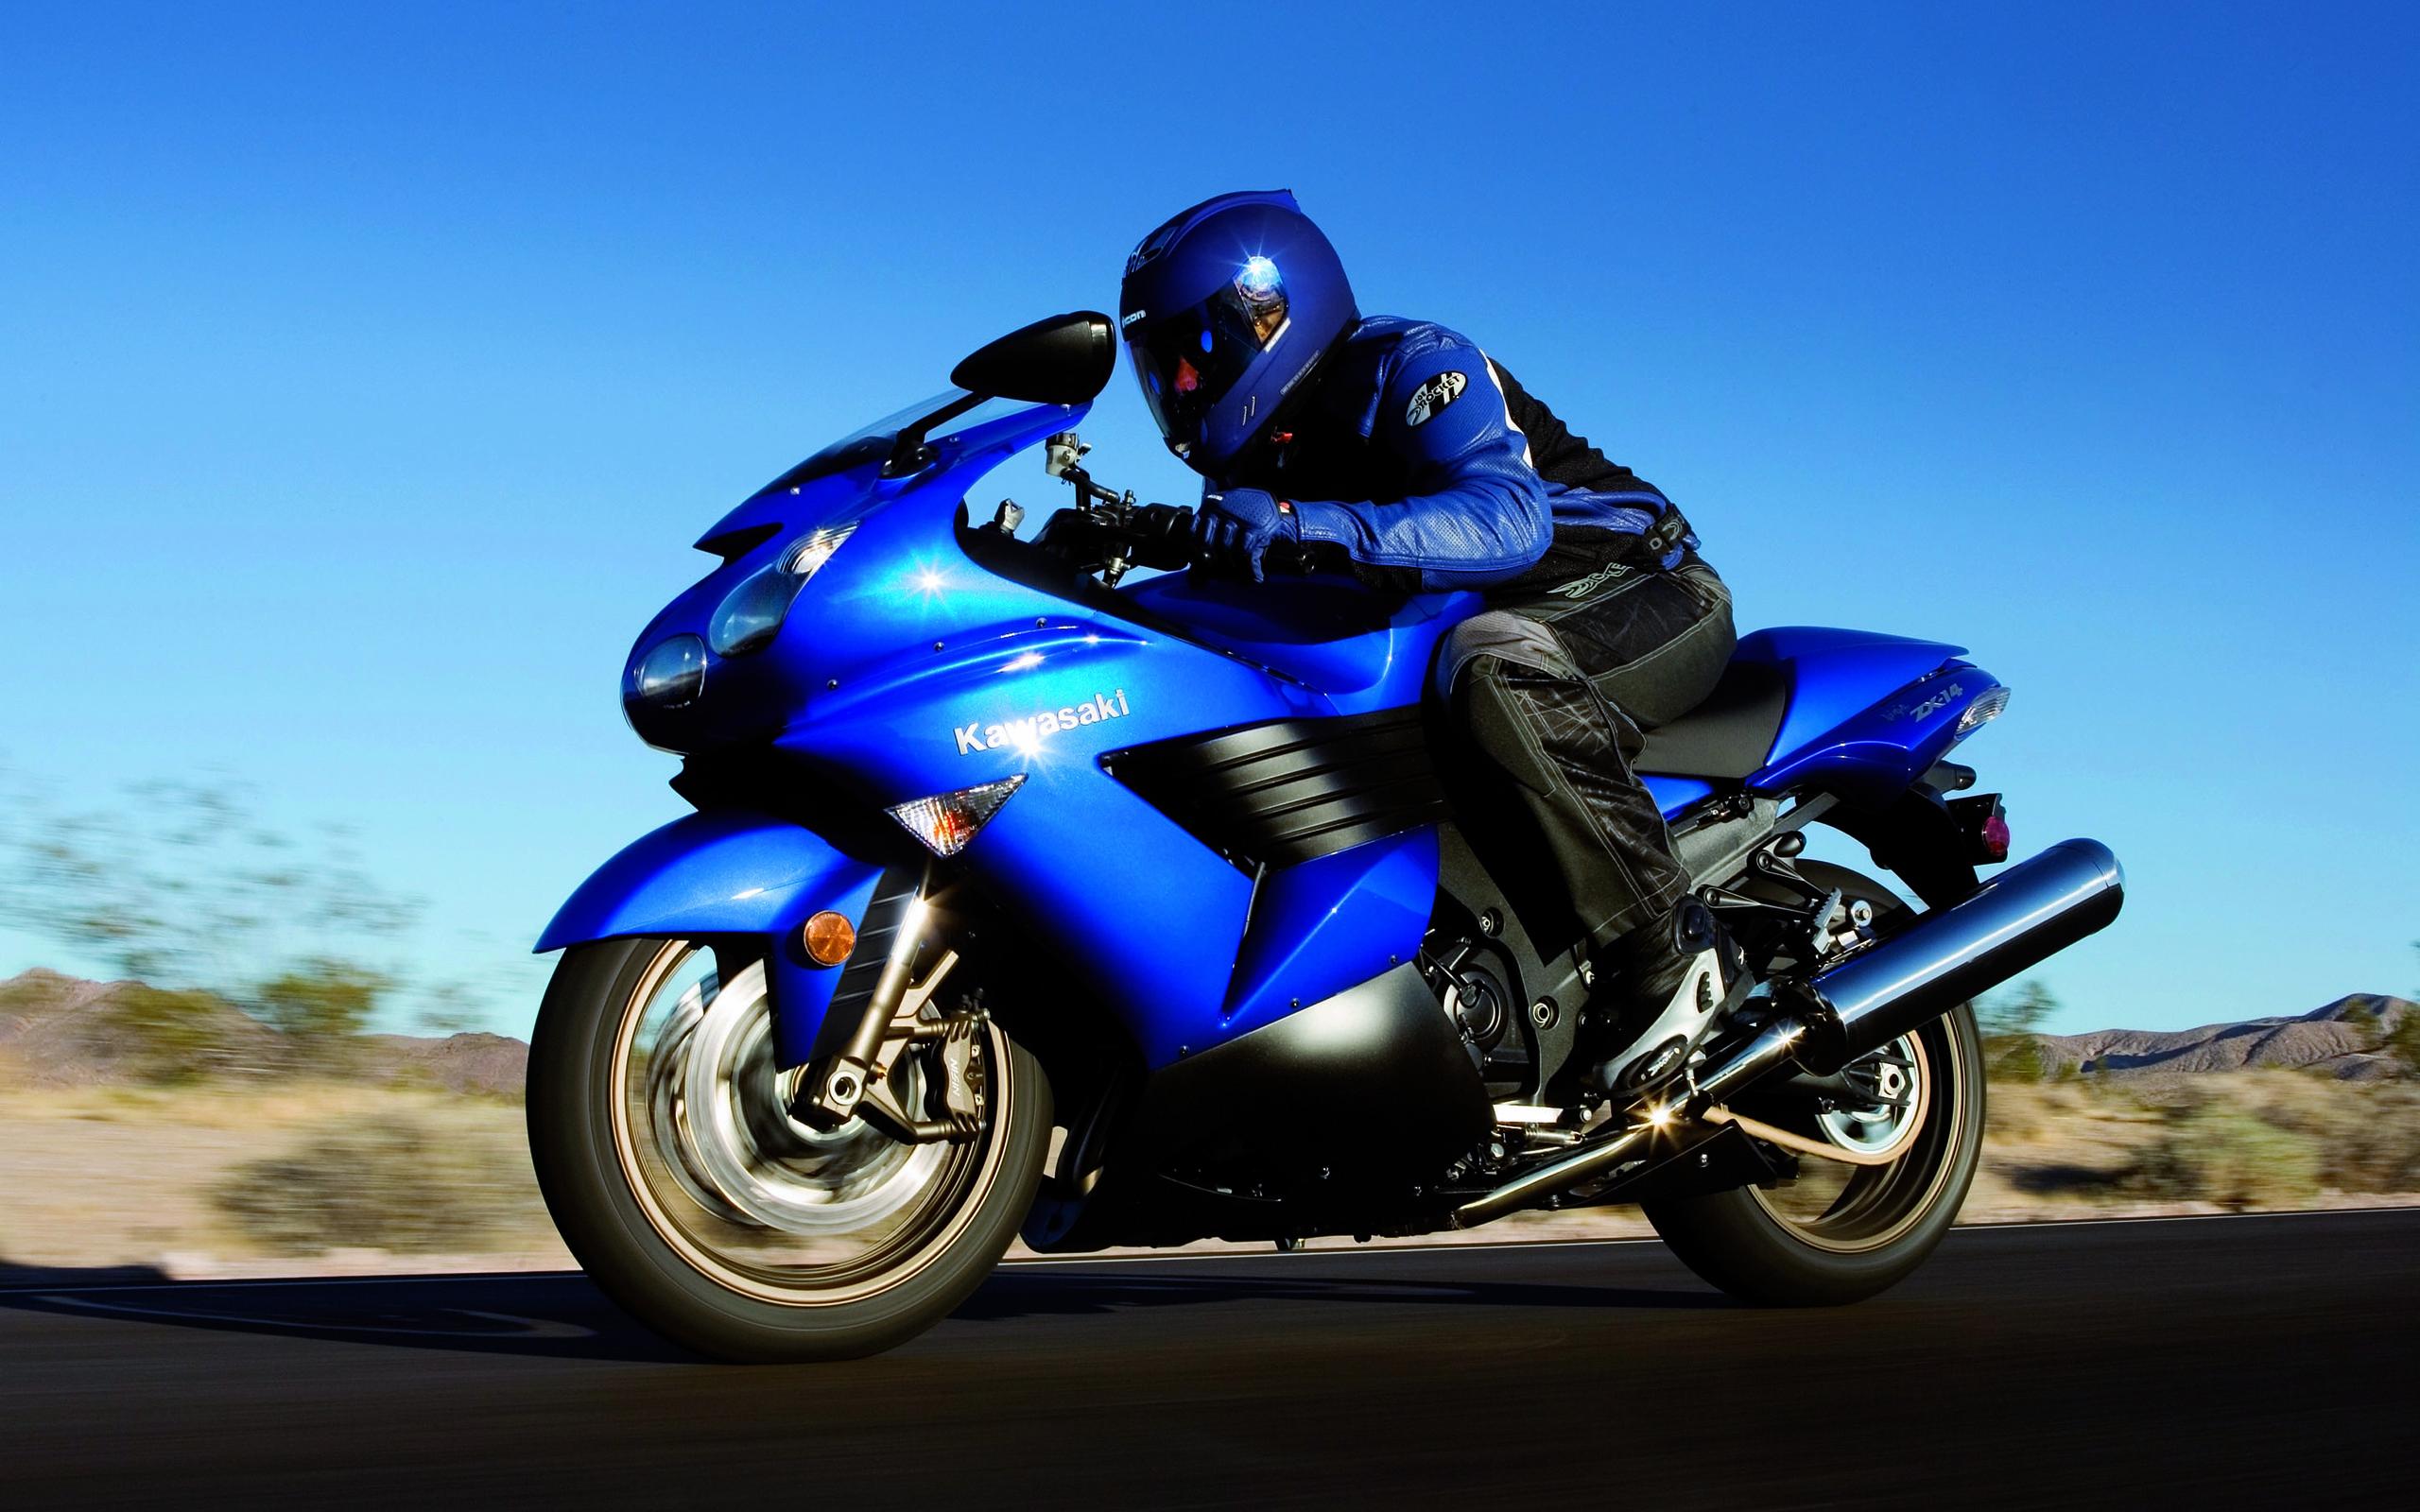 Обои motorcycle. Мотоциклы foto 12